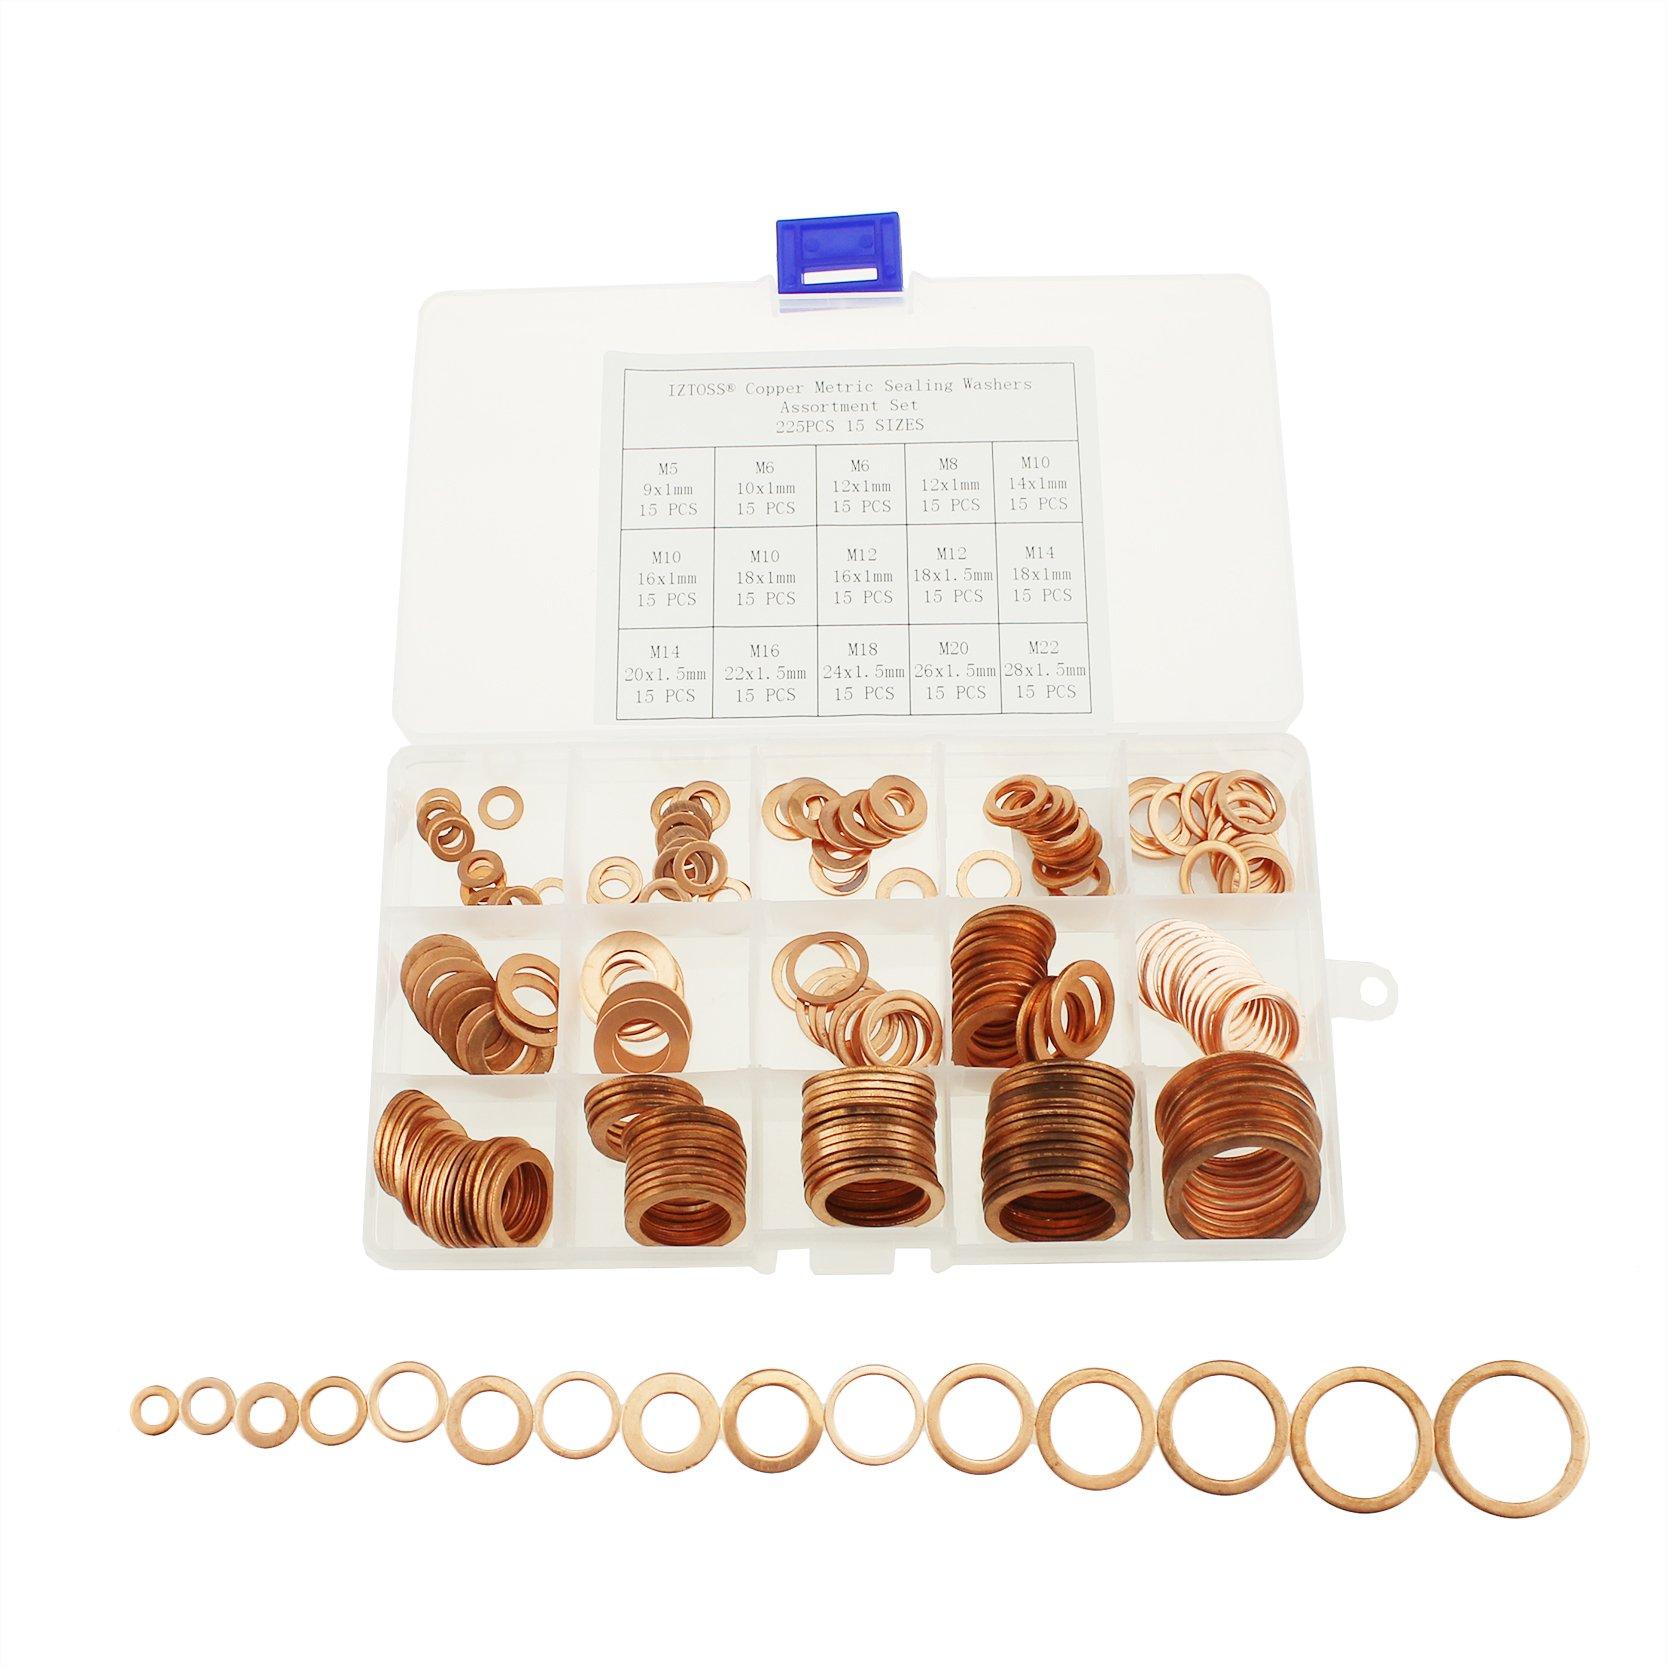 IZTOSS 225Pcs 15 Sizes Copper Metric Sealing Washers Assortment Set-M5 M6 M8 M10 M12 M14 M16 M18 M20 M22